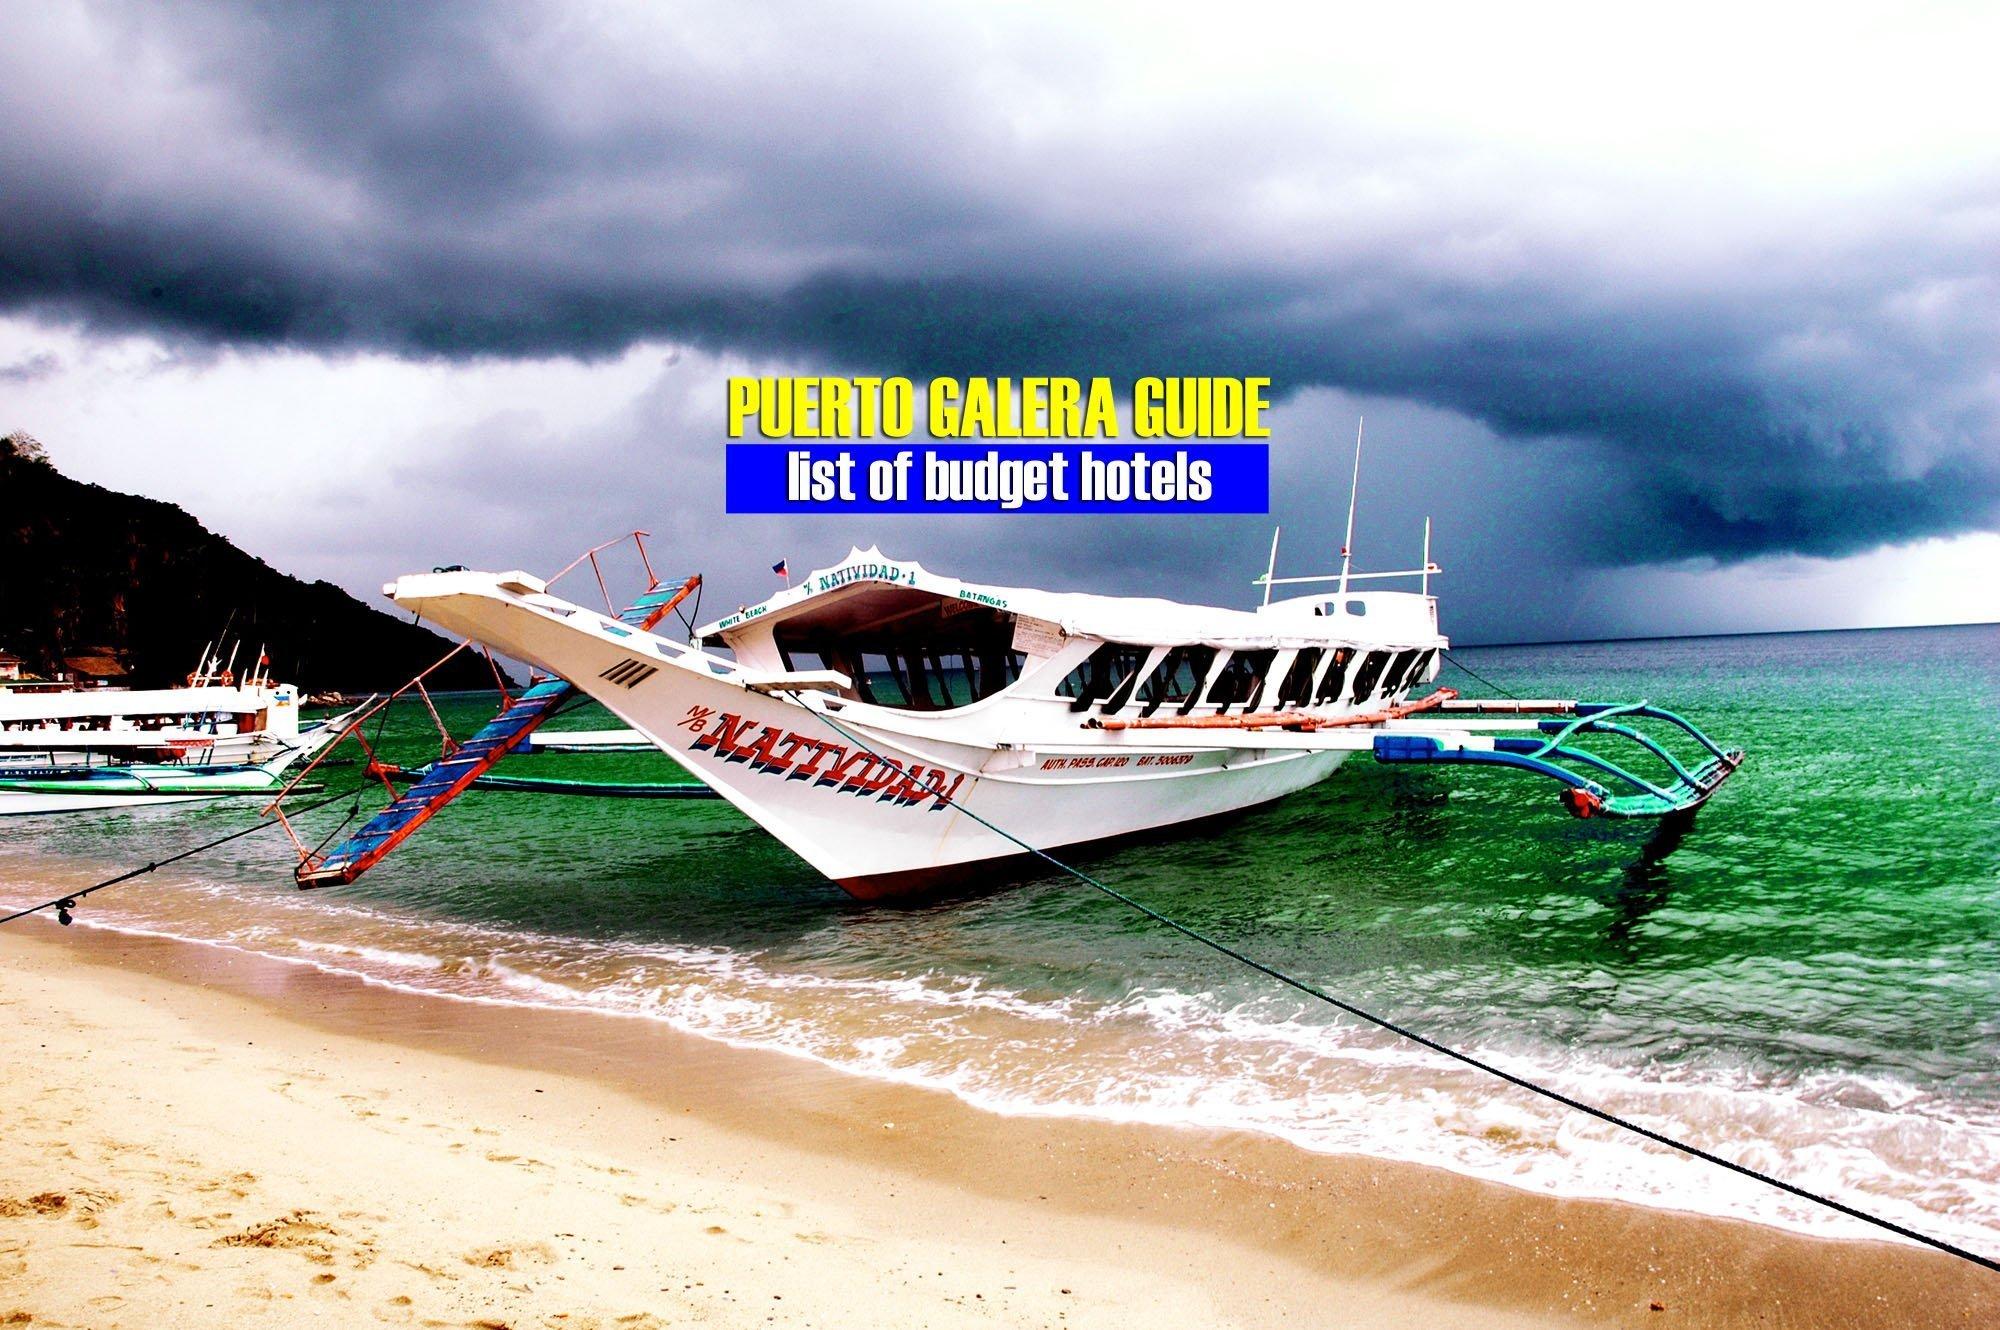 Best Budget Hotels in Puerto Galera